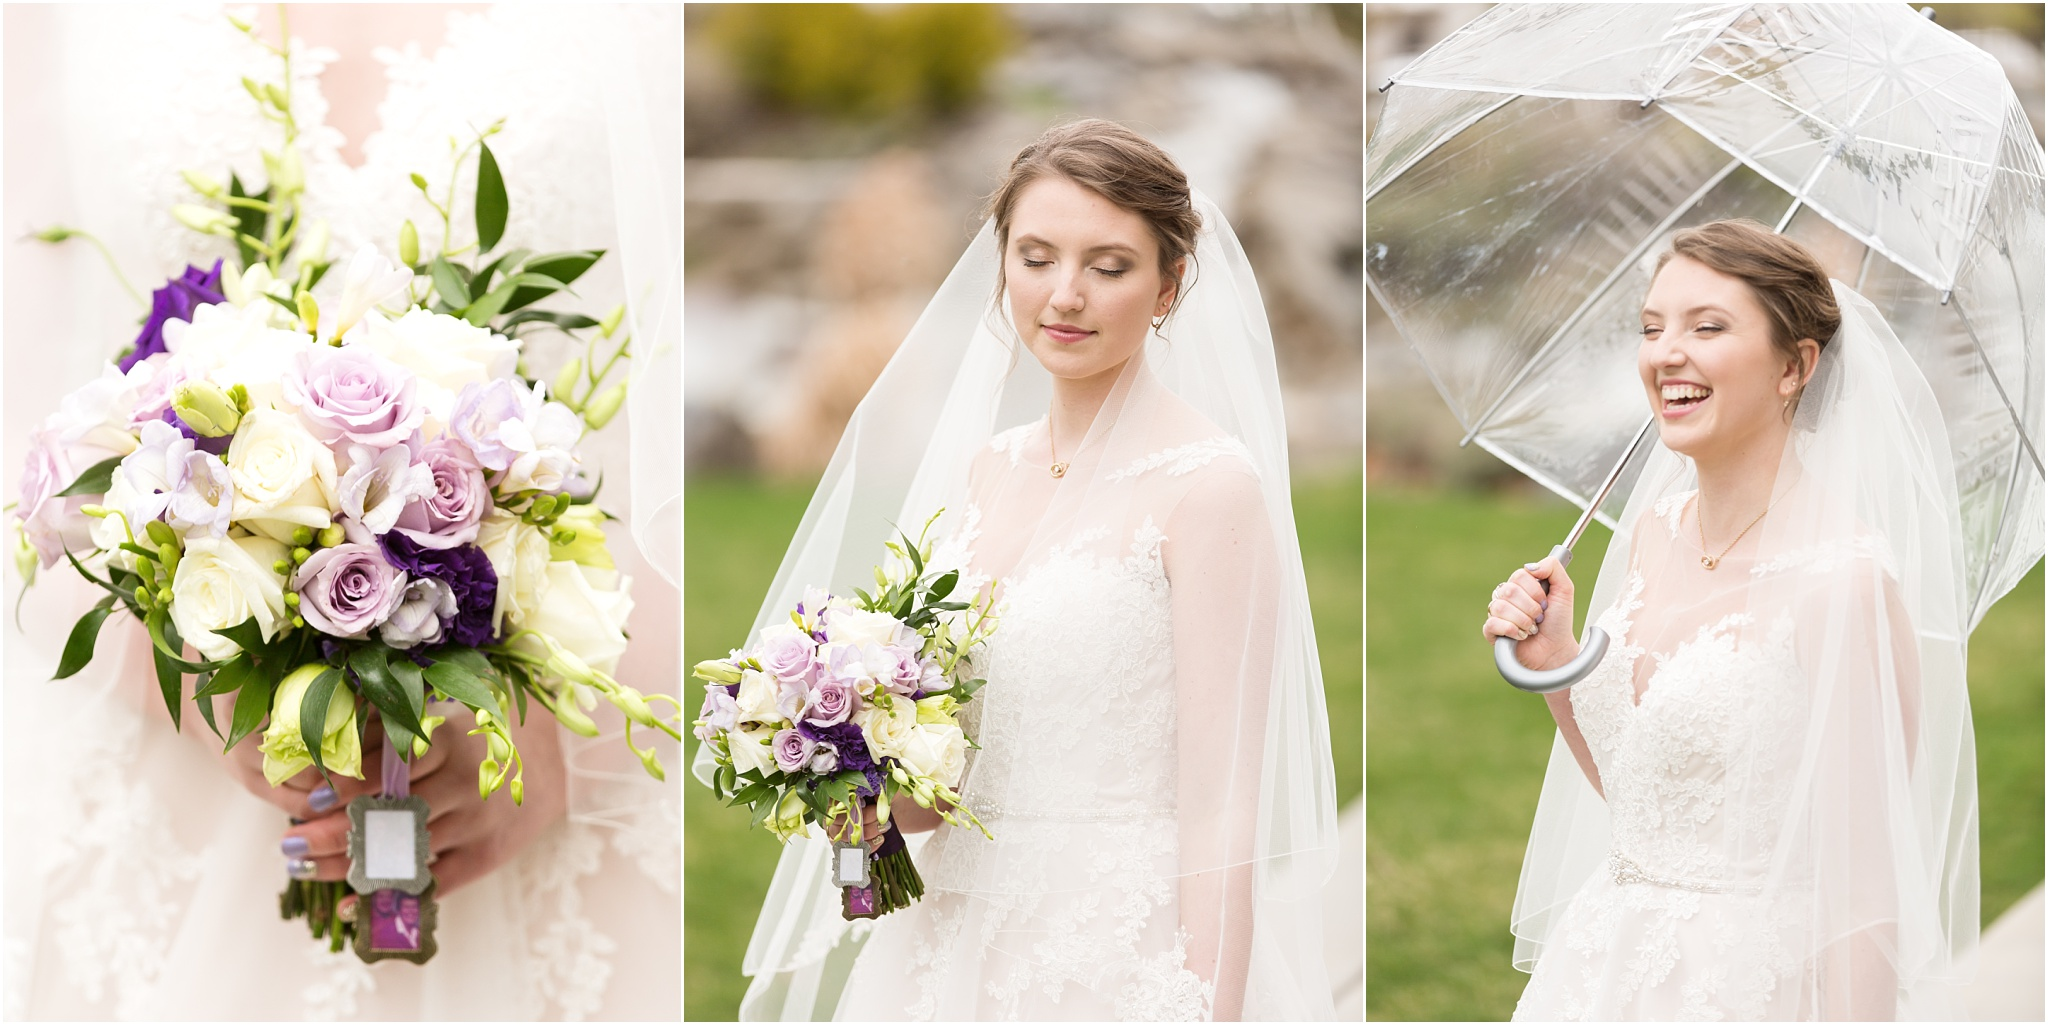 Wedding Photography_Meridian Idaho_Nampa Idaho_Leah Southwick Photography_0070.jpg